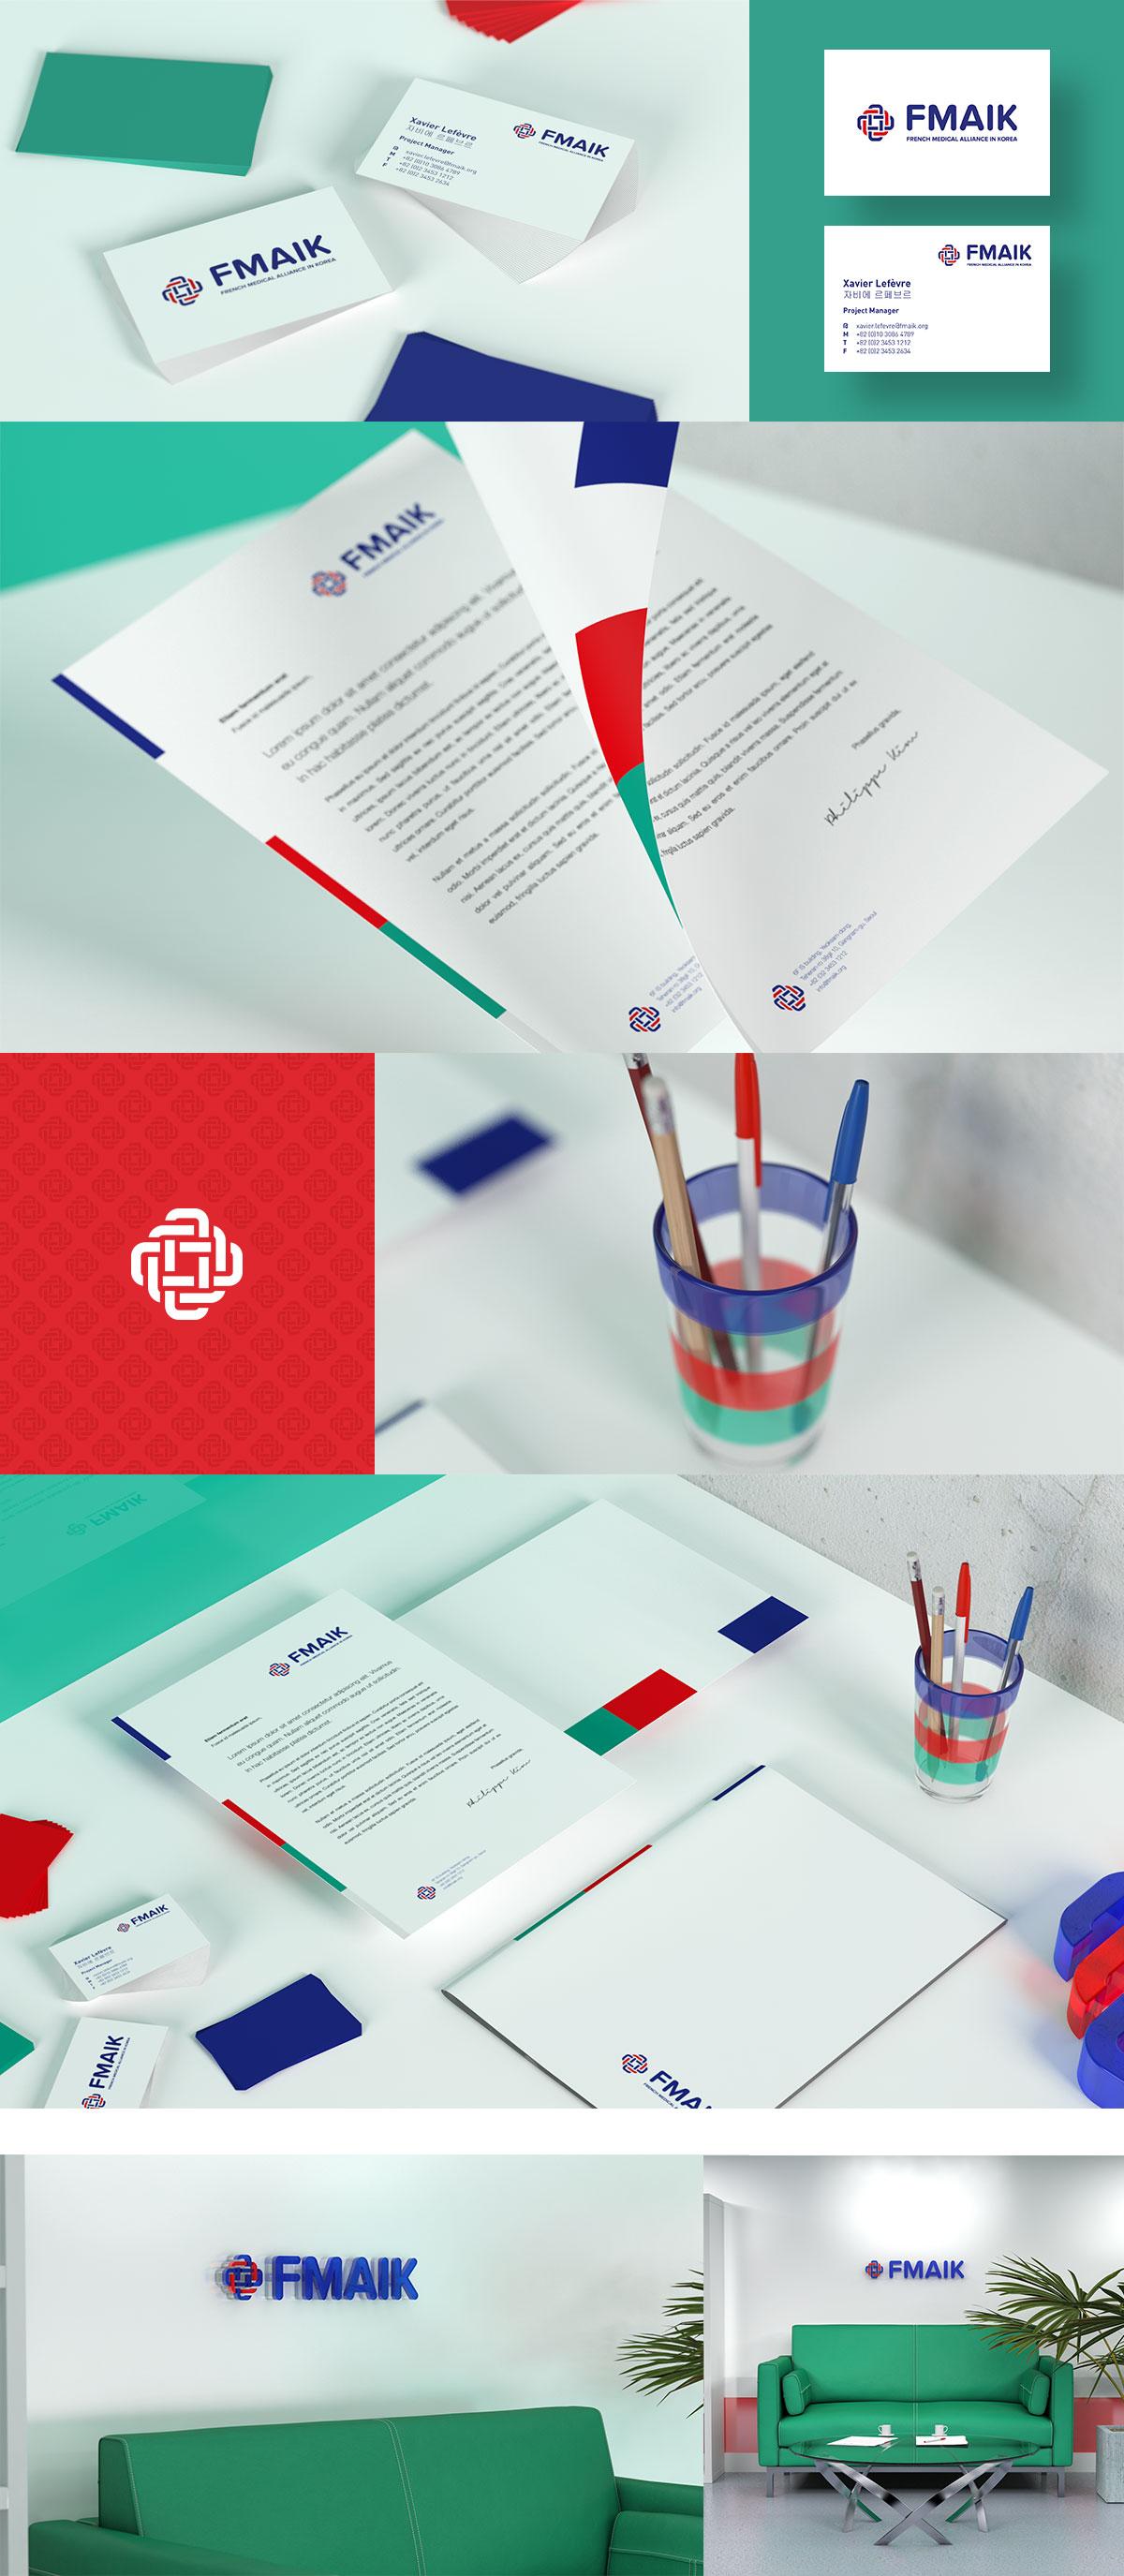 fmaik-brand-visualization